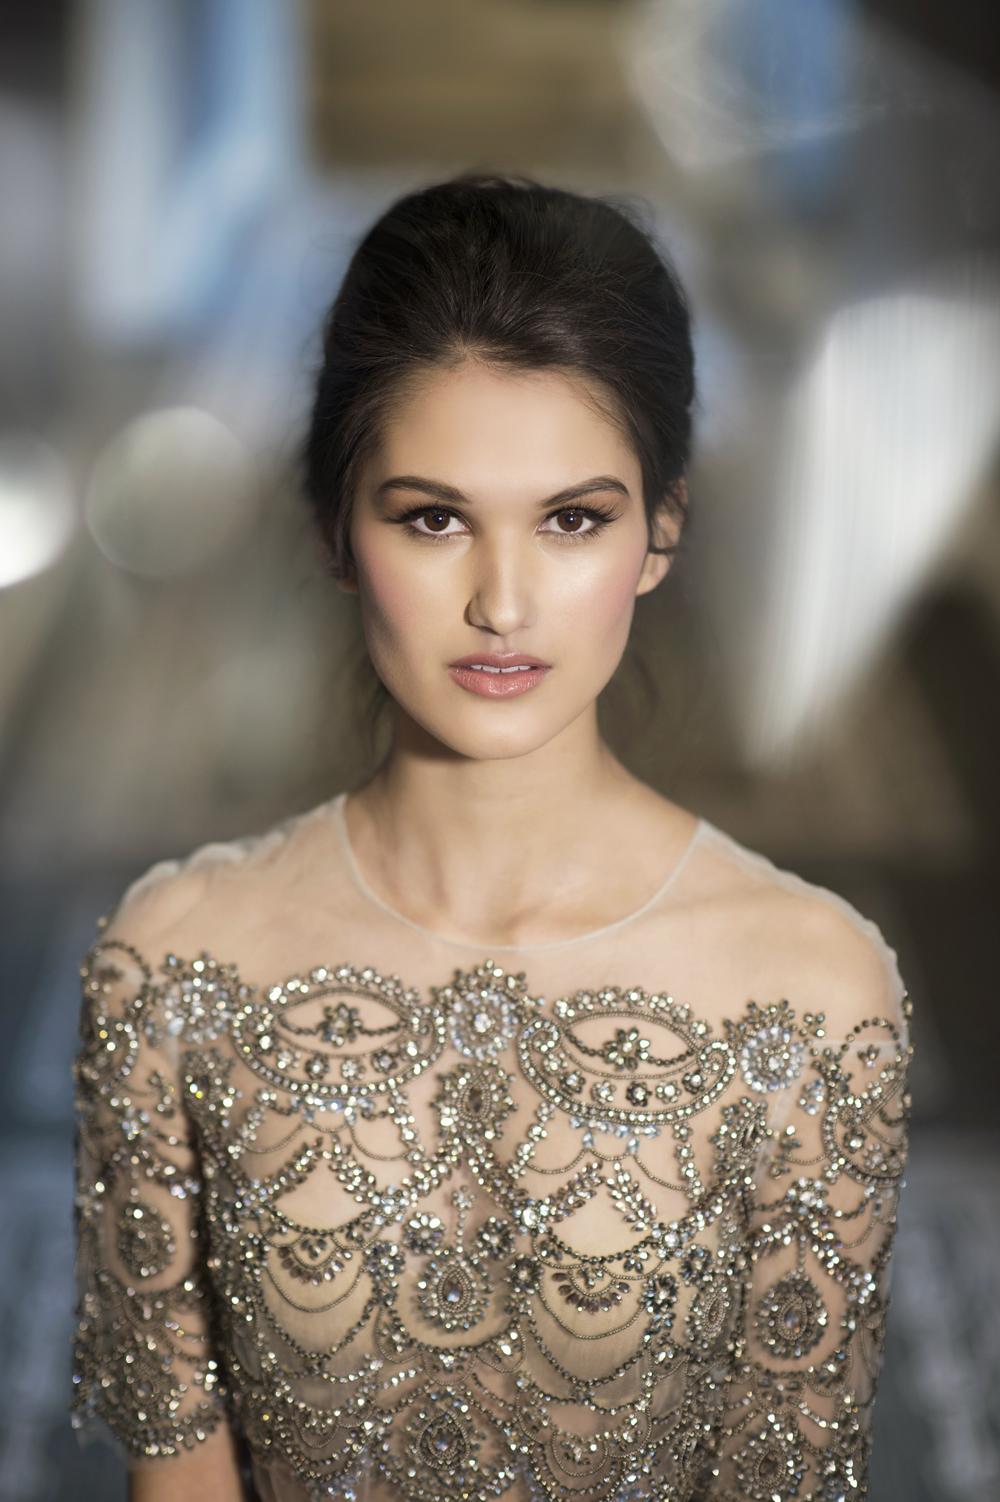 natural and at-home beauty hacks for brides